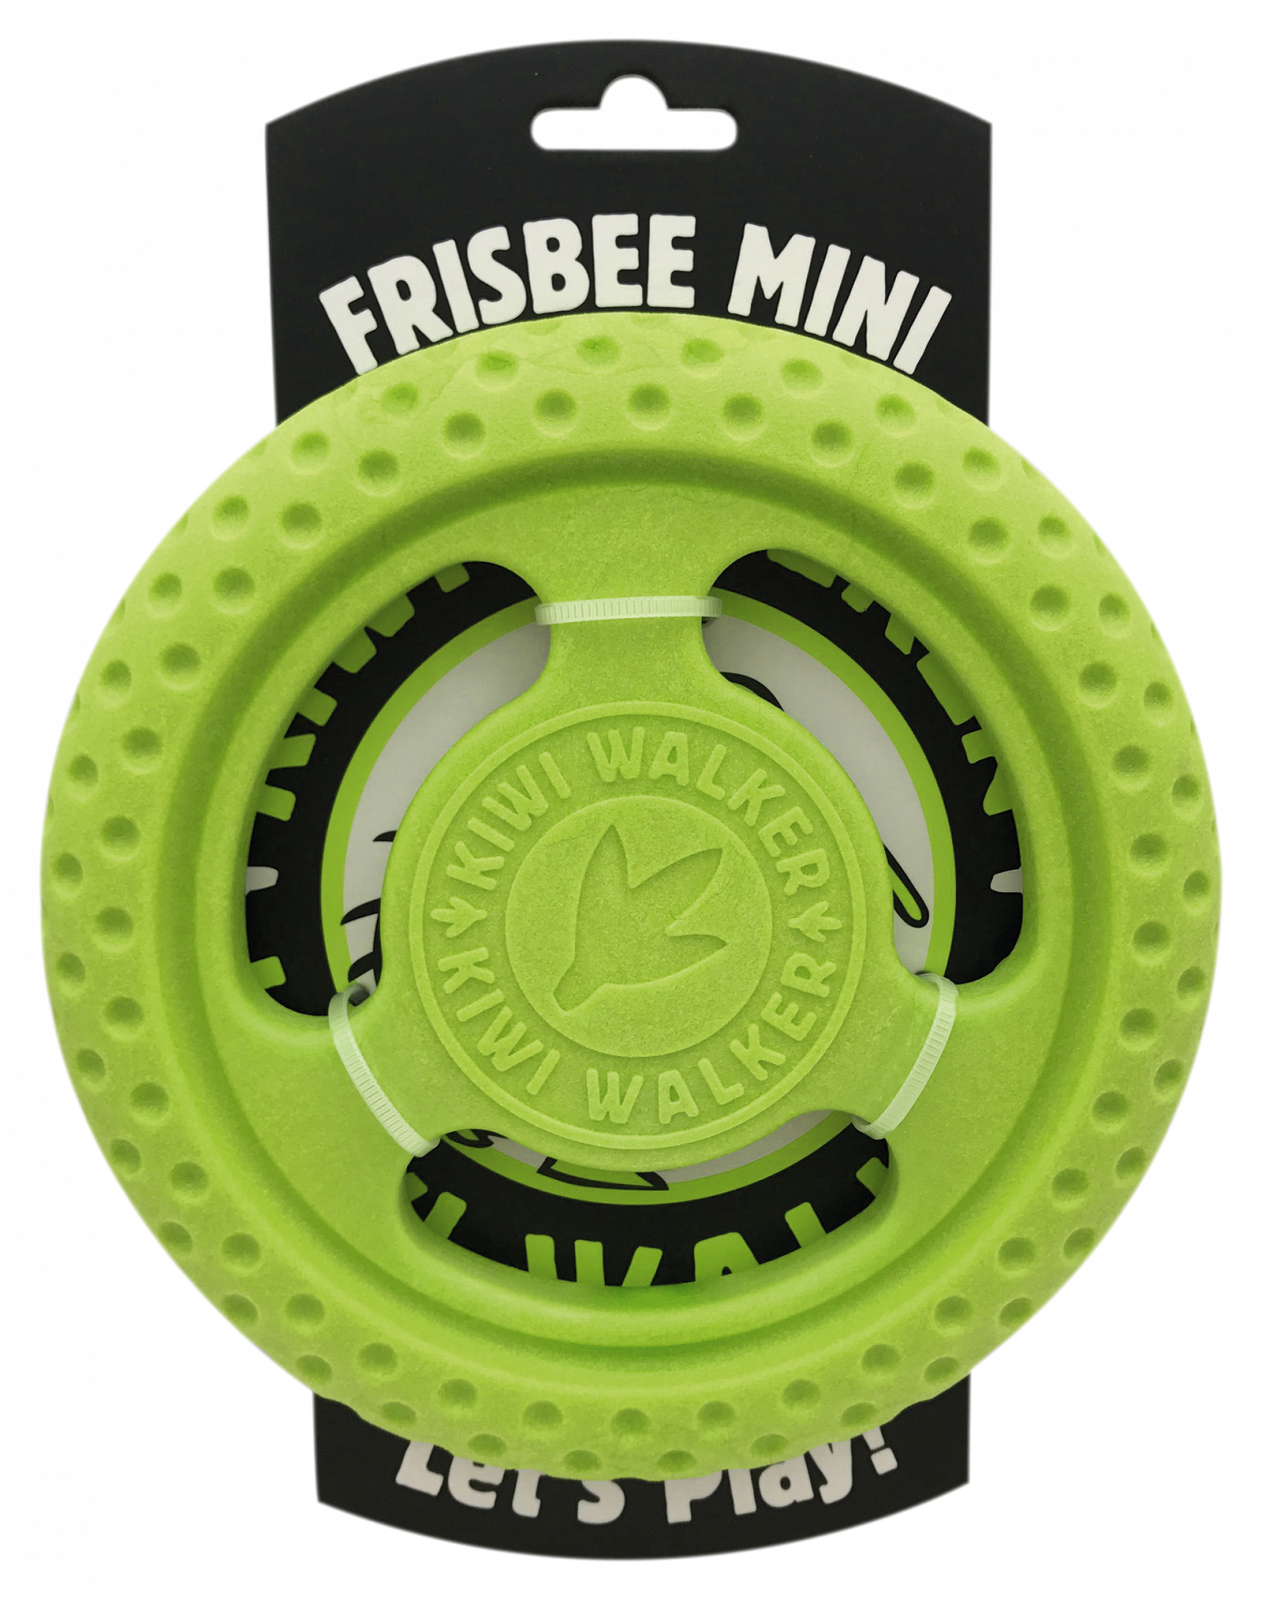 KiwiWalker Let's play! FRISBEE MINI green (16cm)